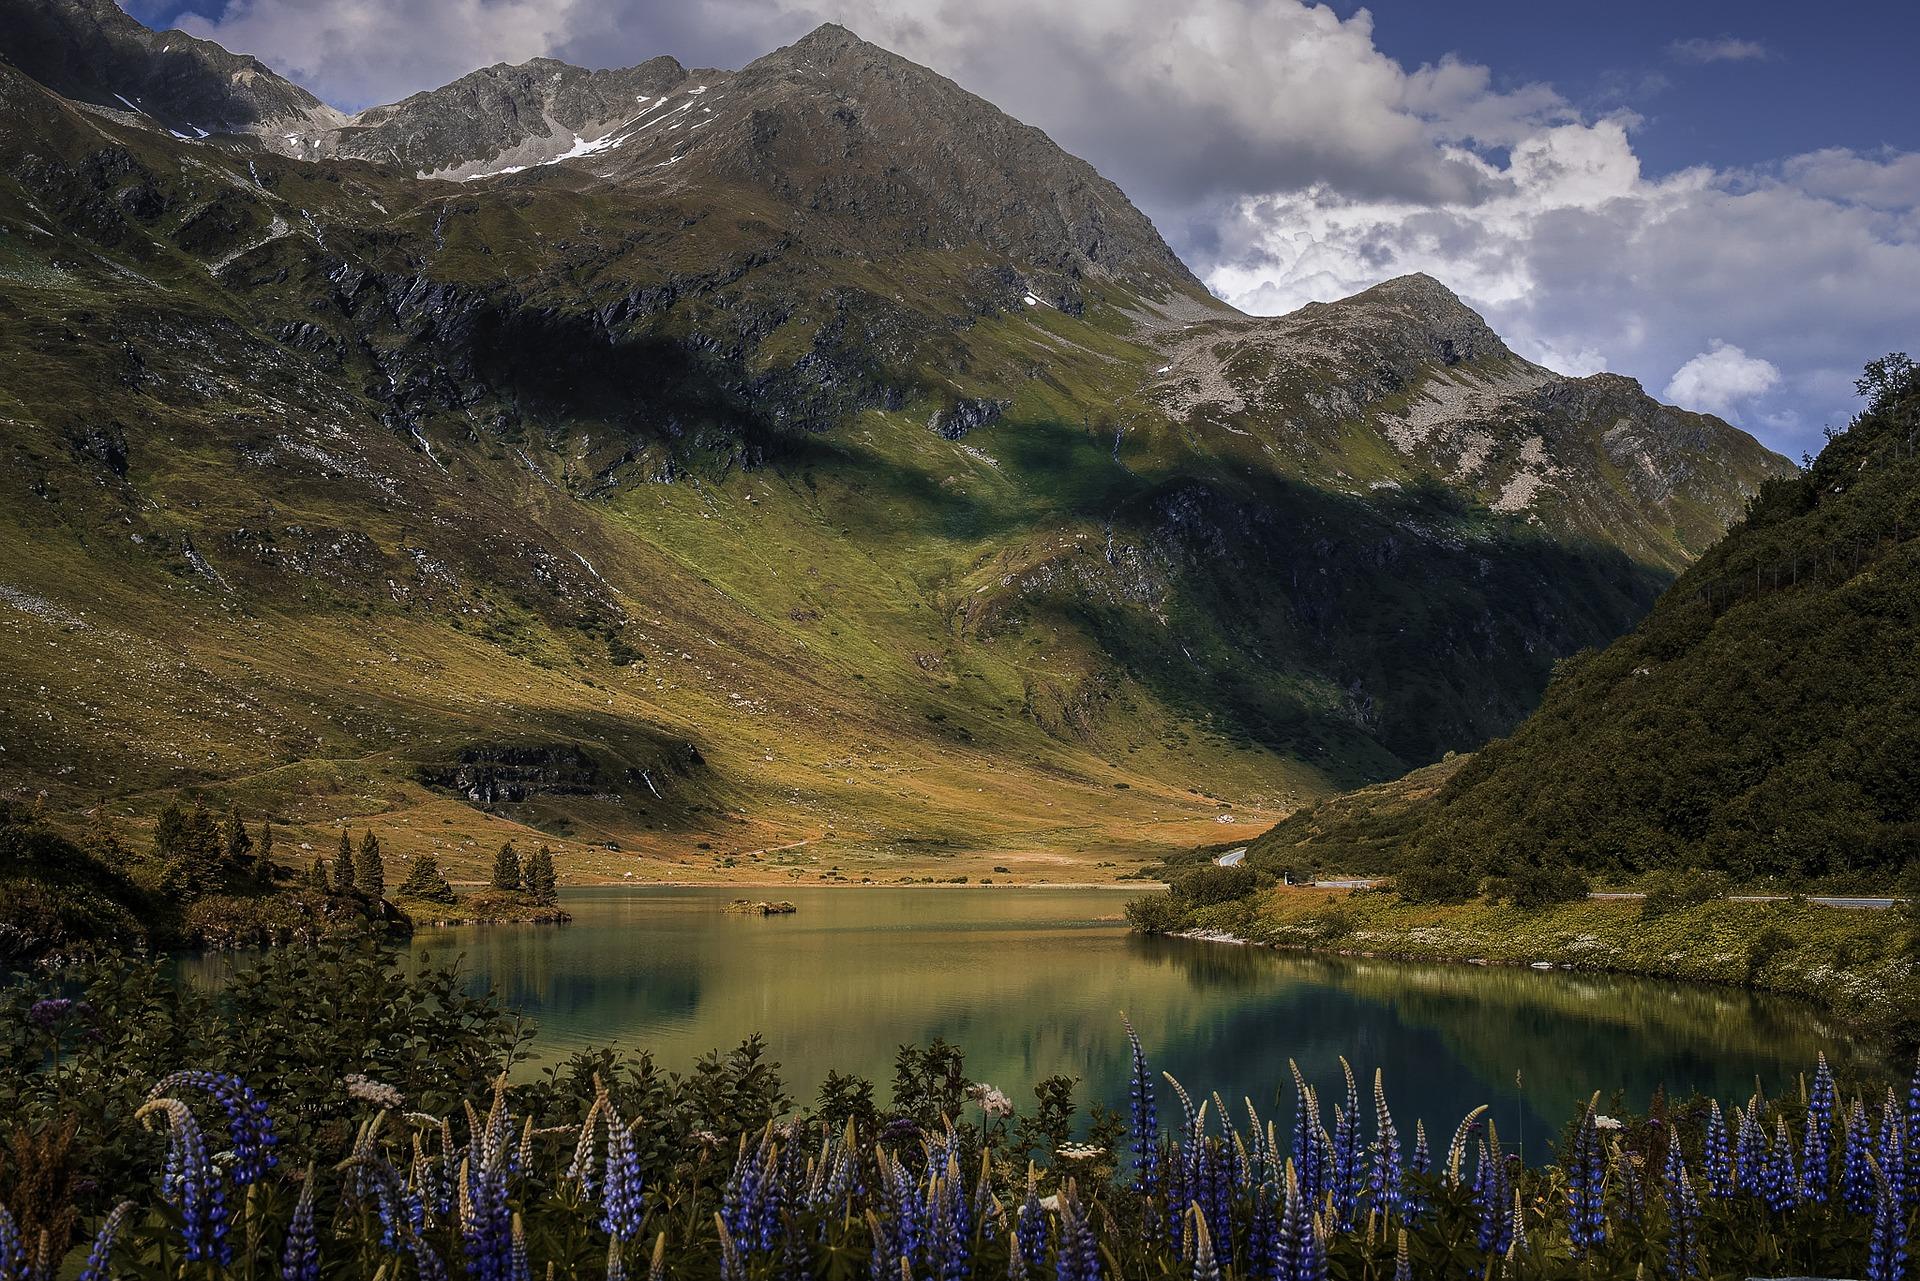 Reiseziel Alpen (Foto: globalpixxel CC0)